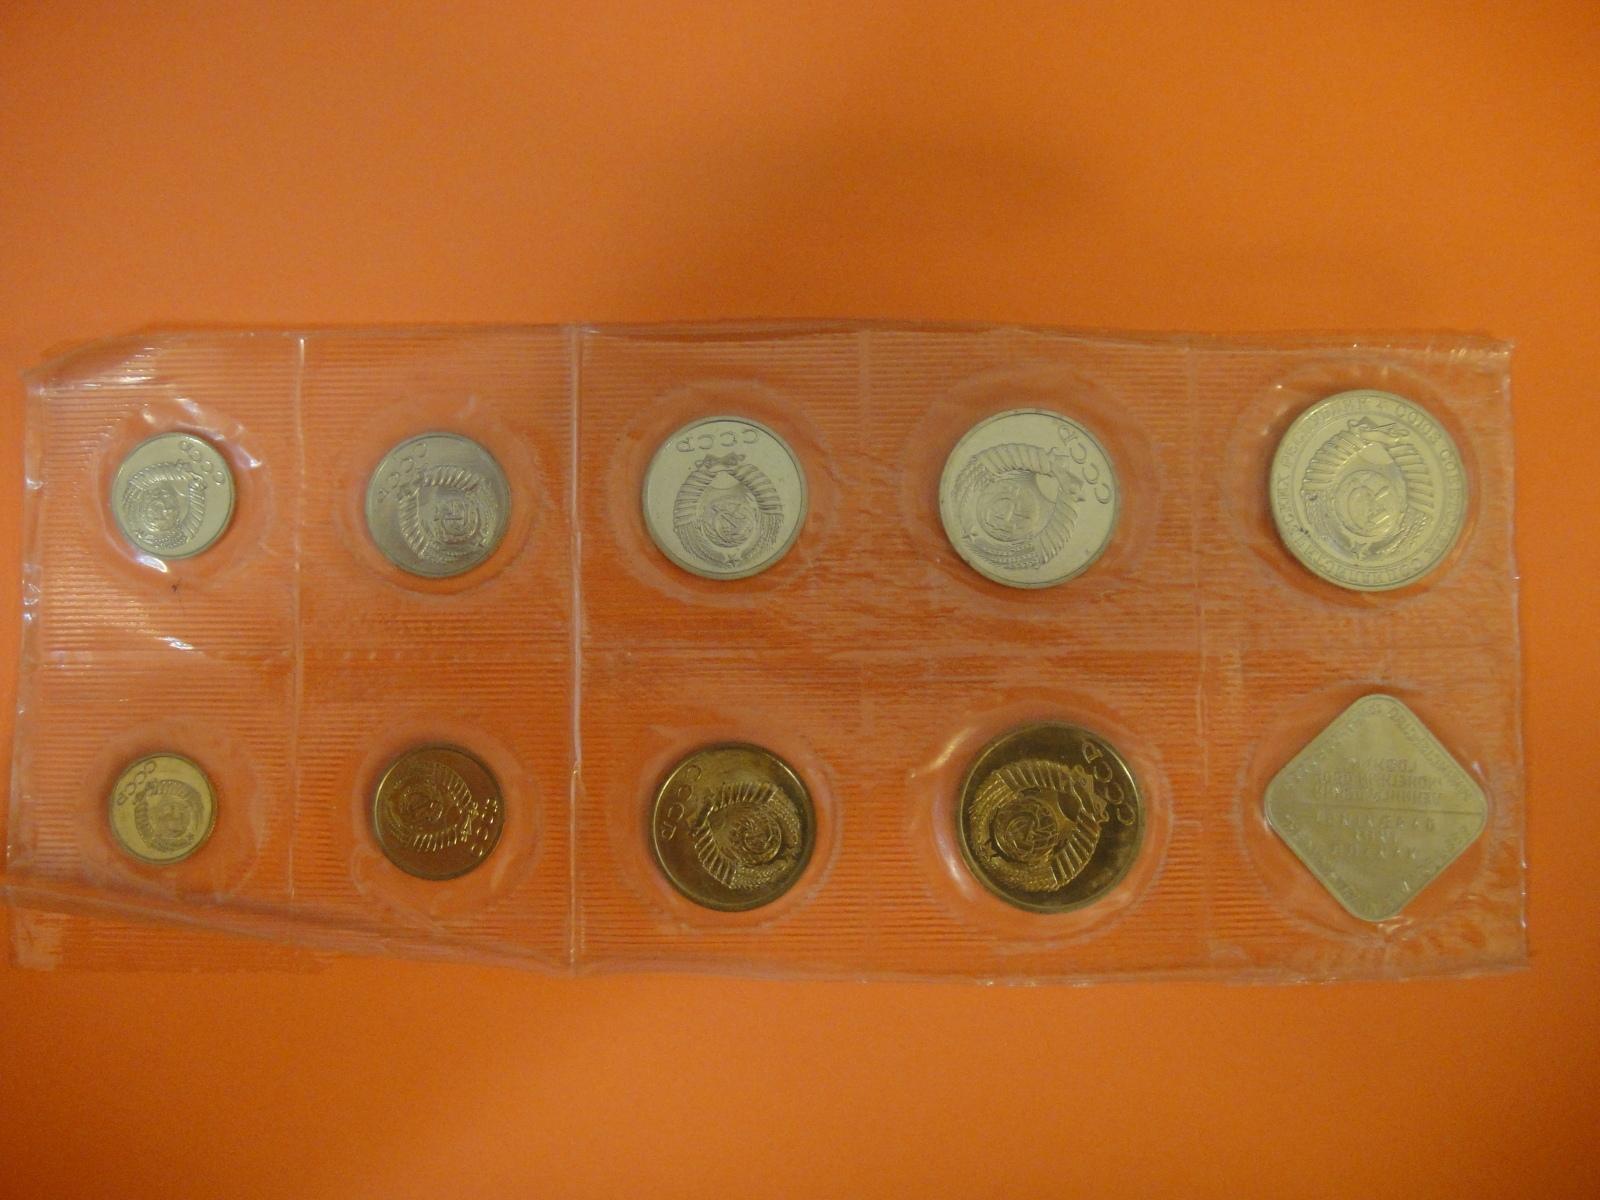 Monedas URSS - Antigua Unión Soviética 2jc6all